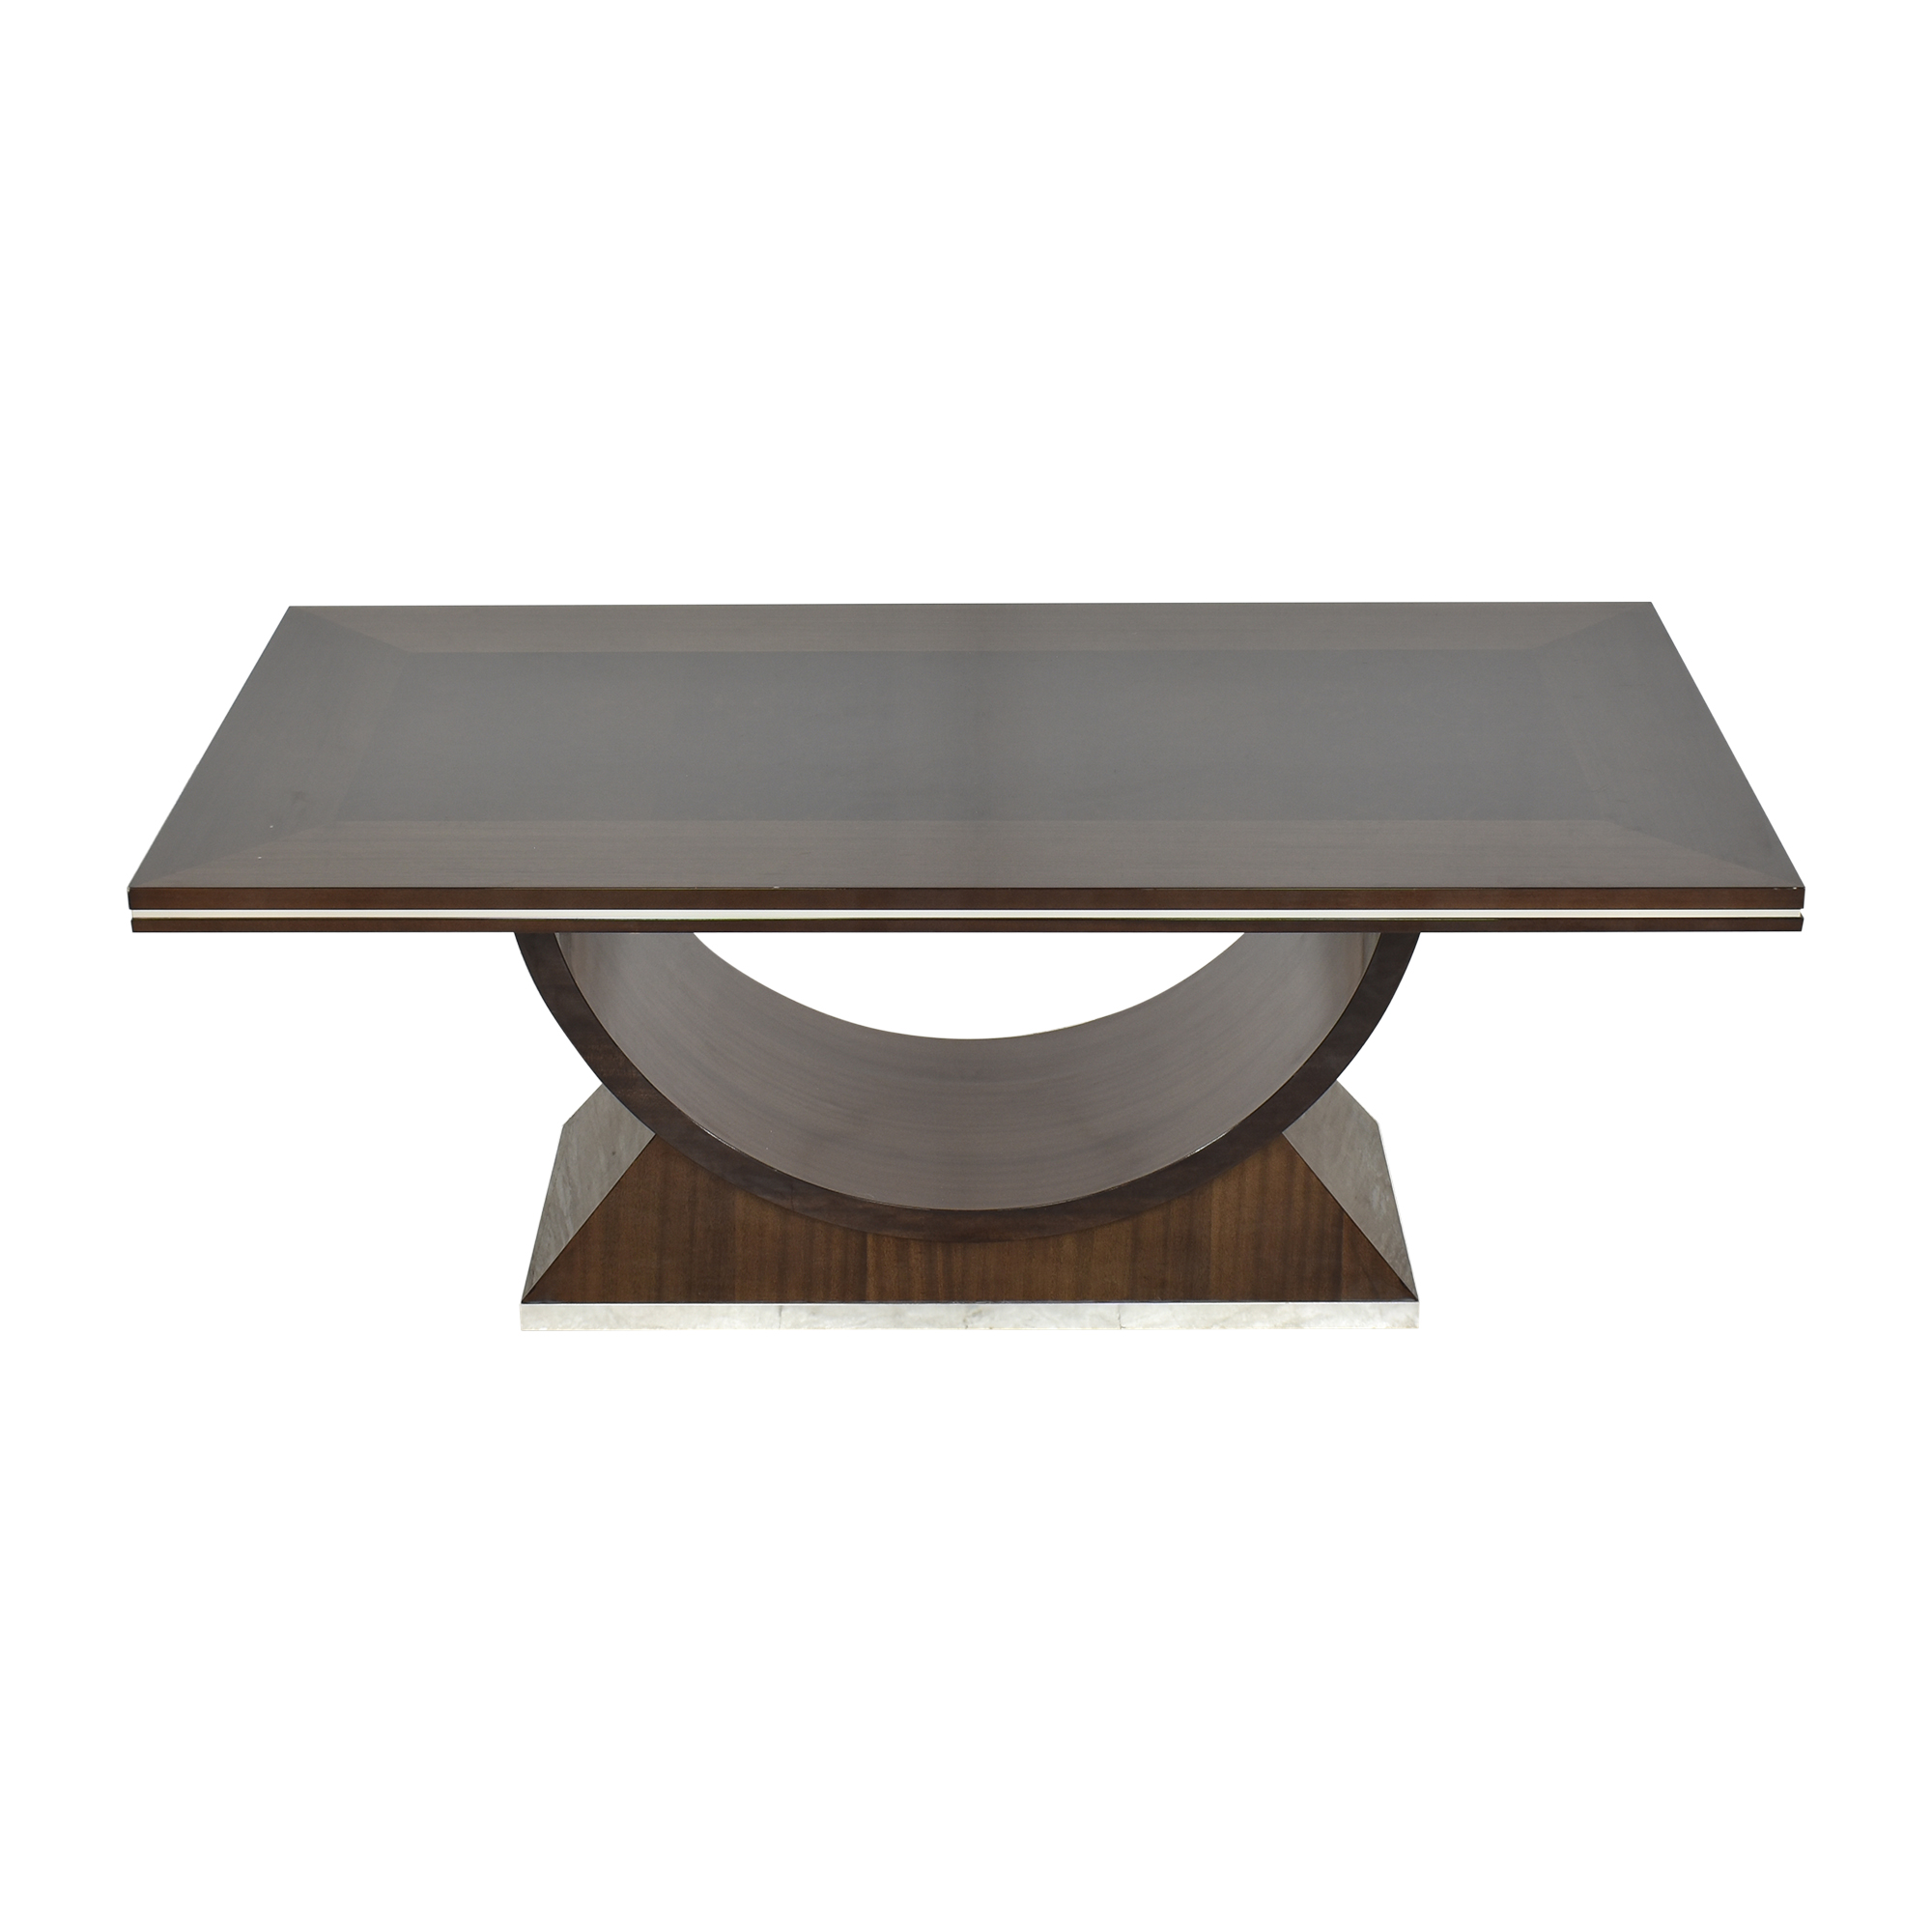 Pietro Costantini Pietro Costantini Contemporary Extendable Dining Table Brown